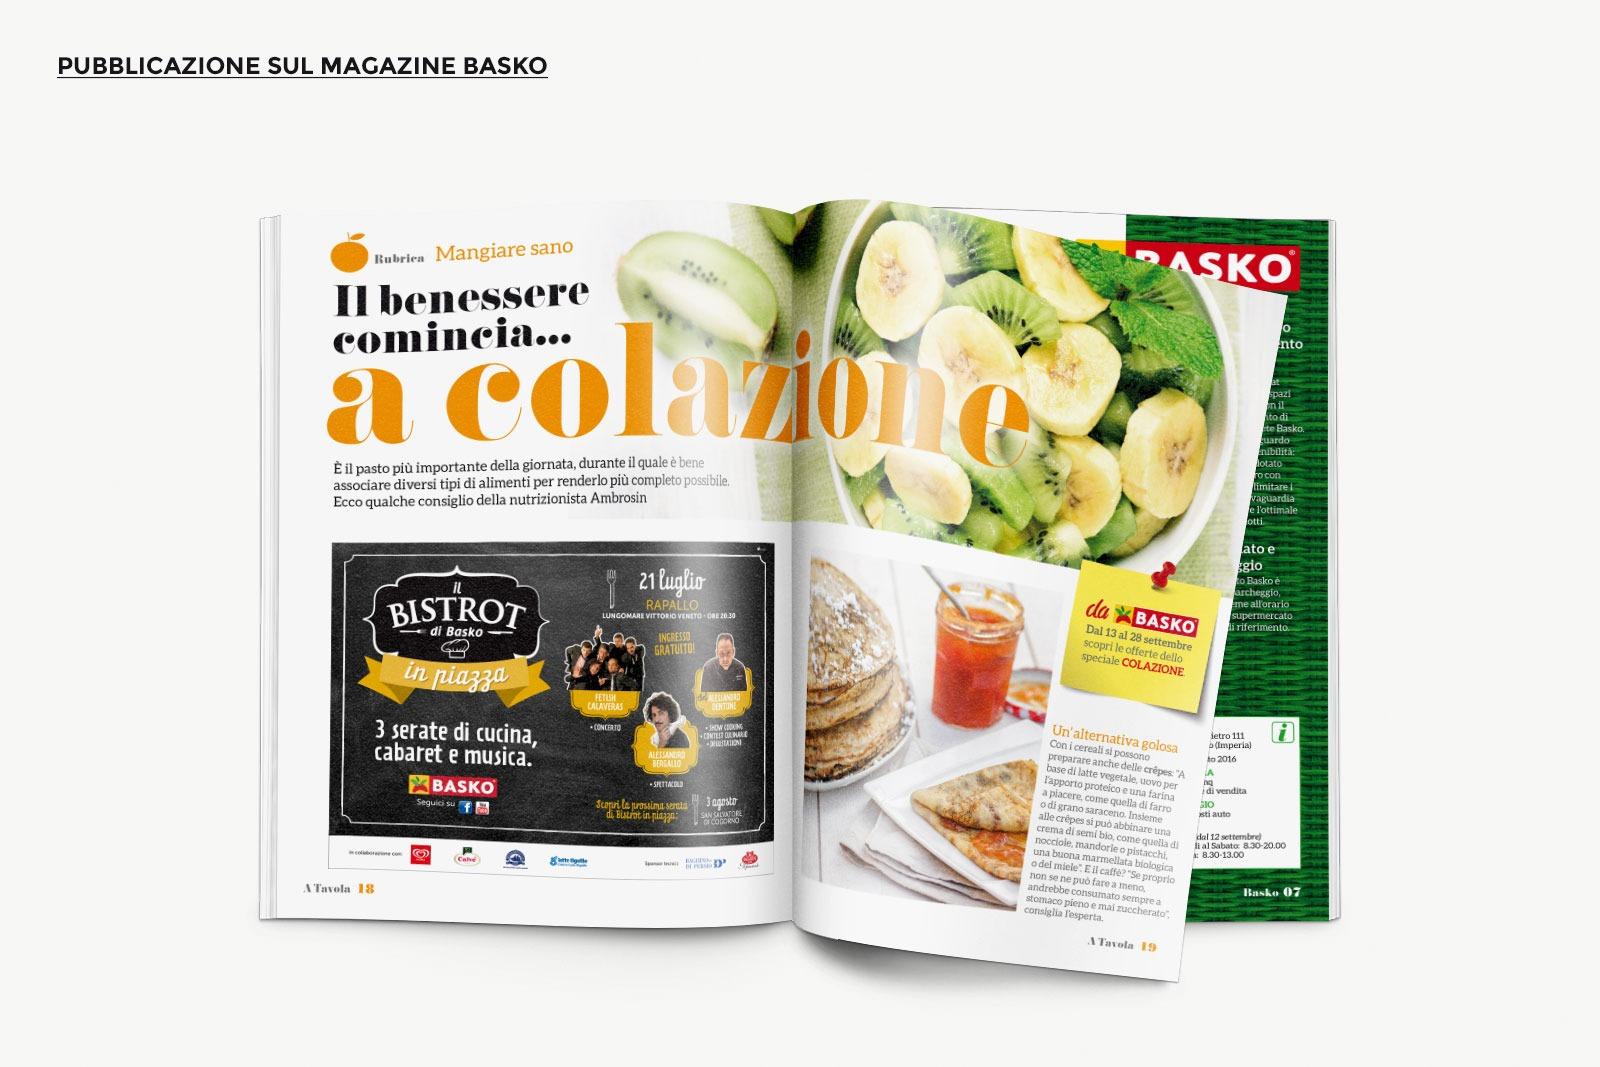 plancia-magazine-basko